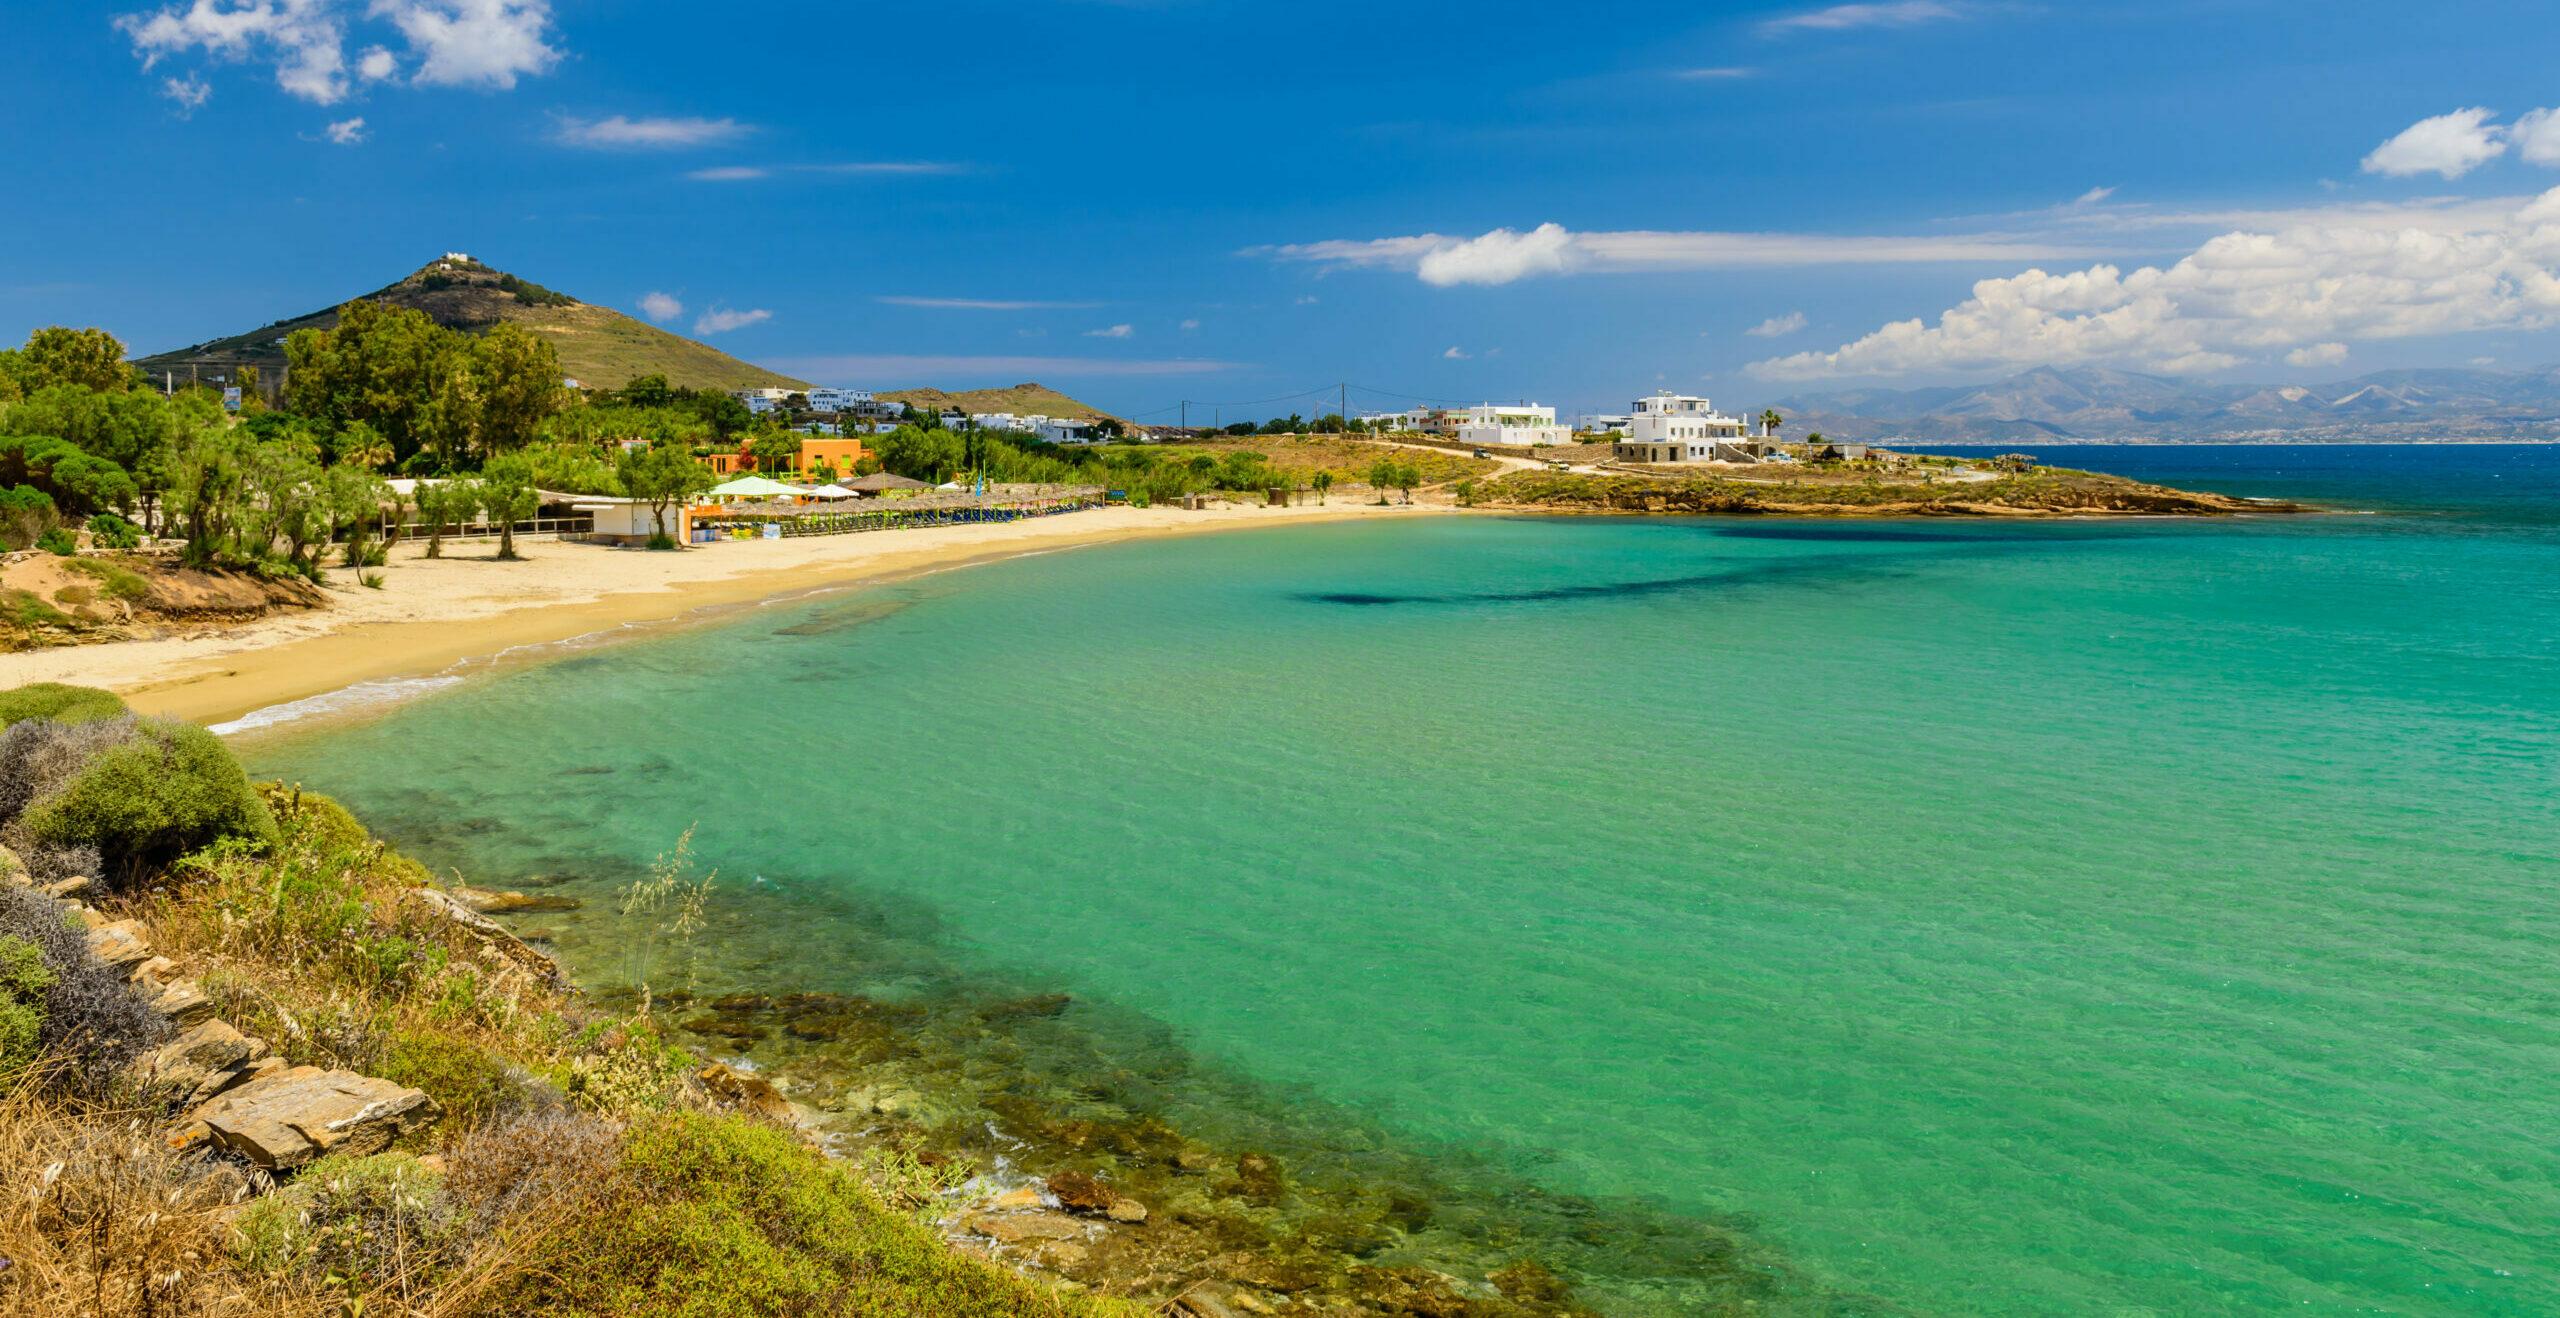 Punta: the beach you go by car and looks like an island